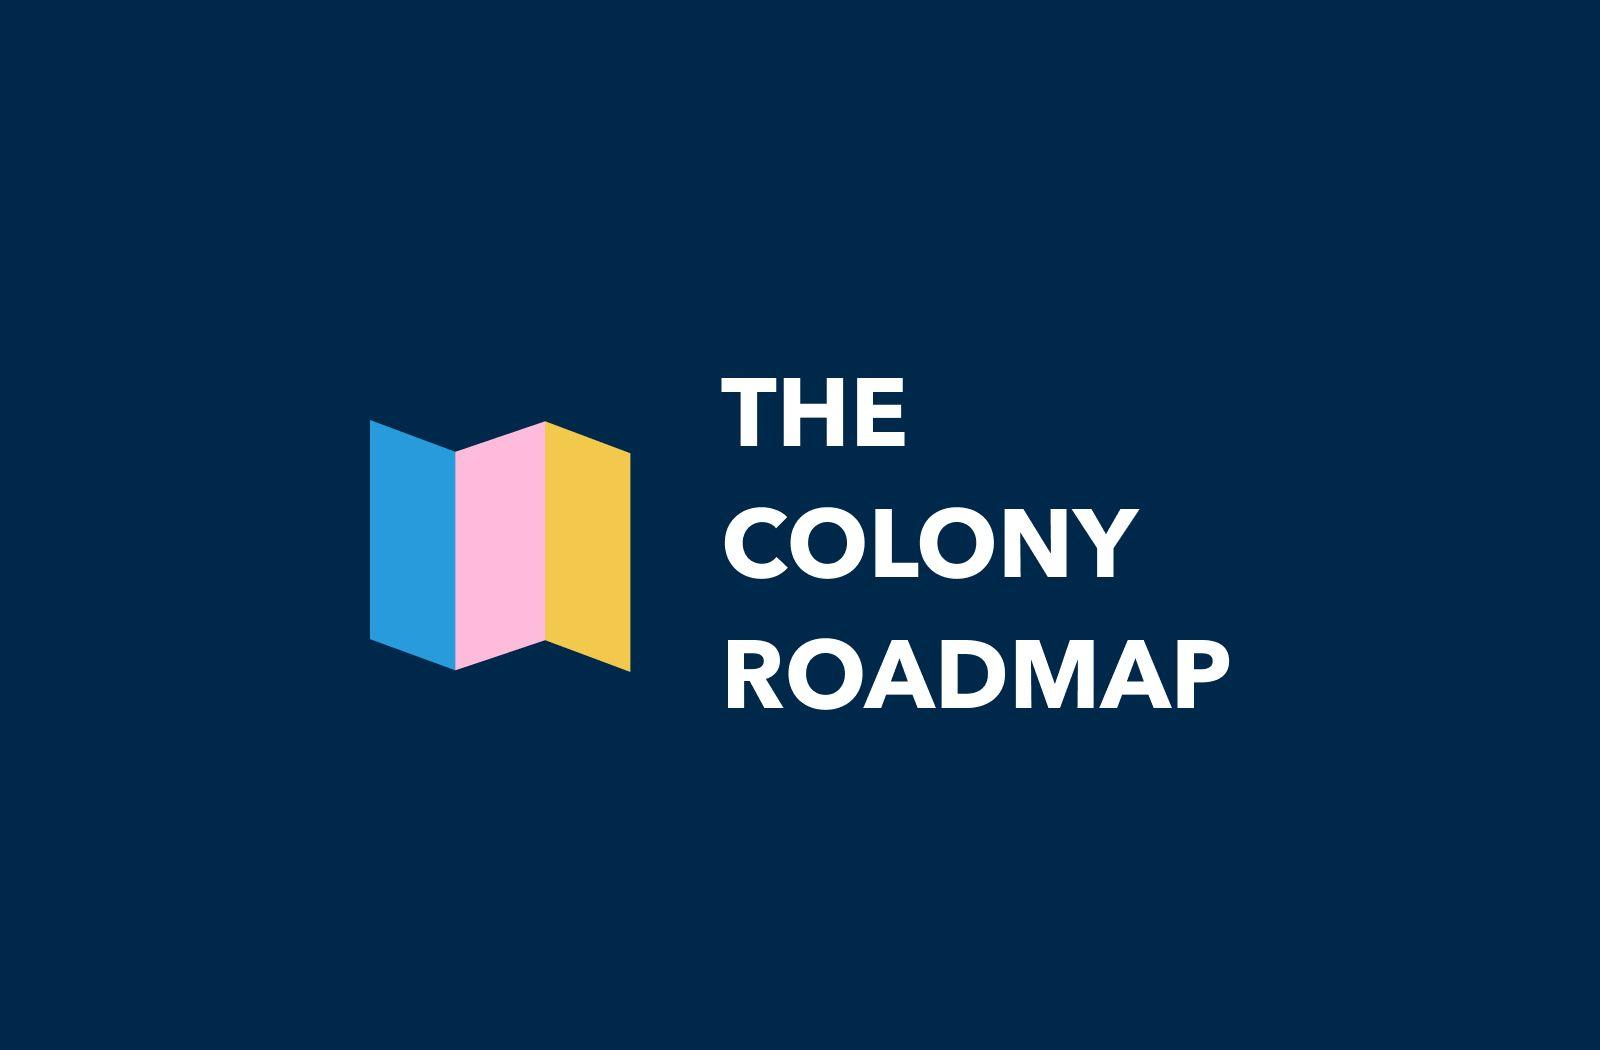 Colony's 2021 Product Roadmap